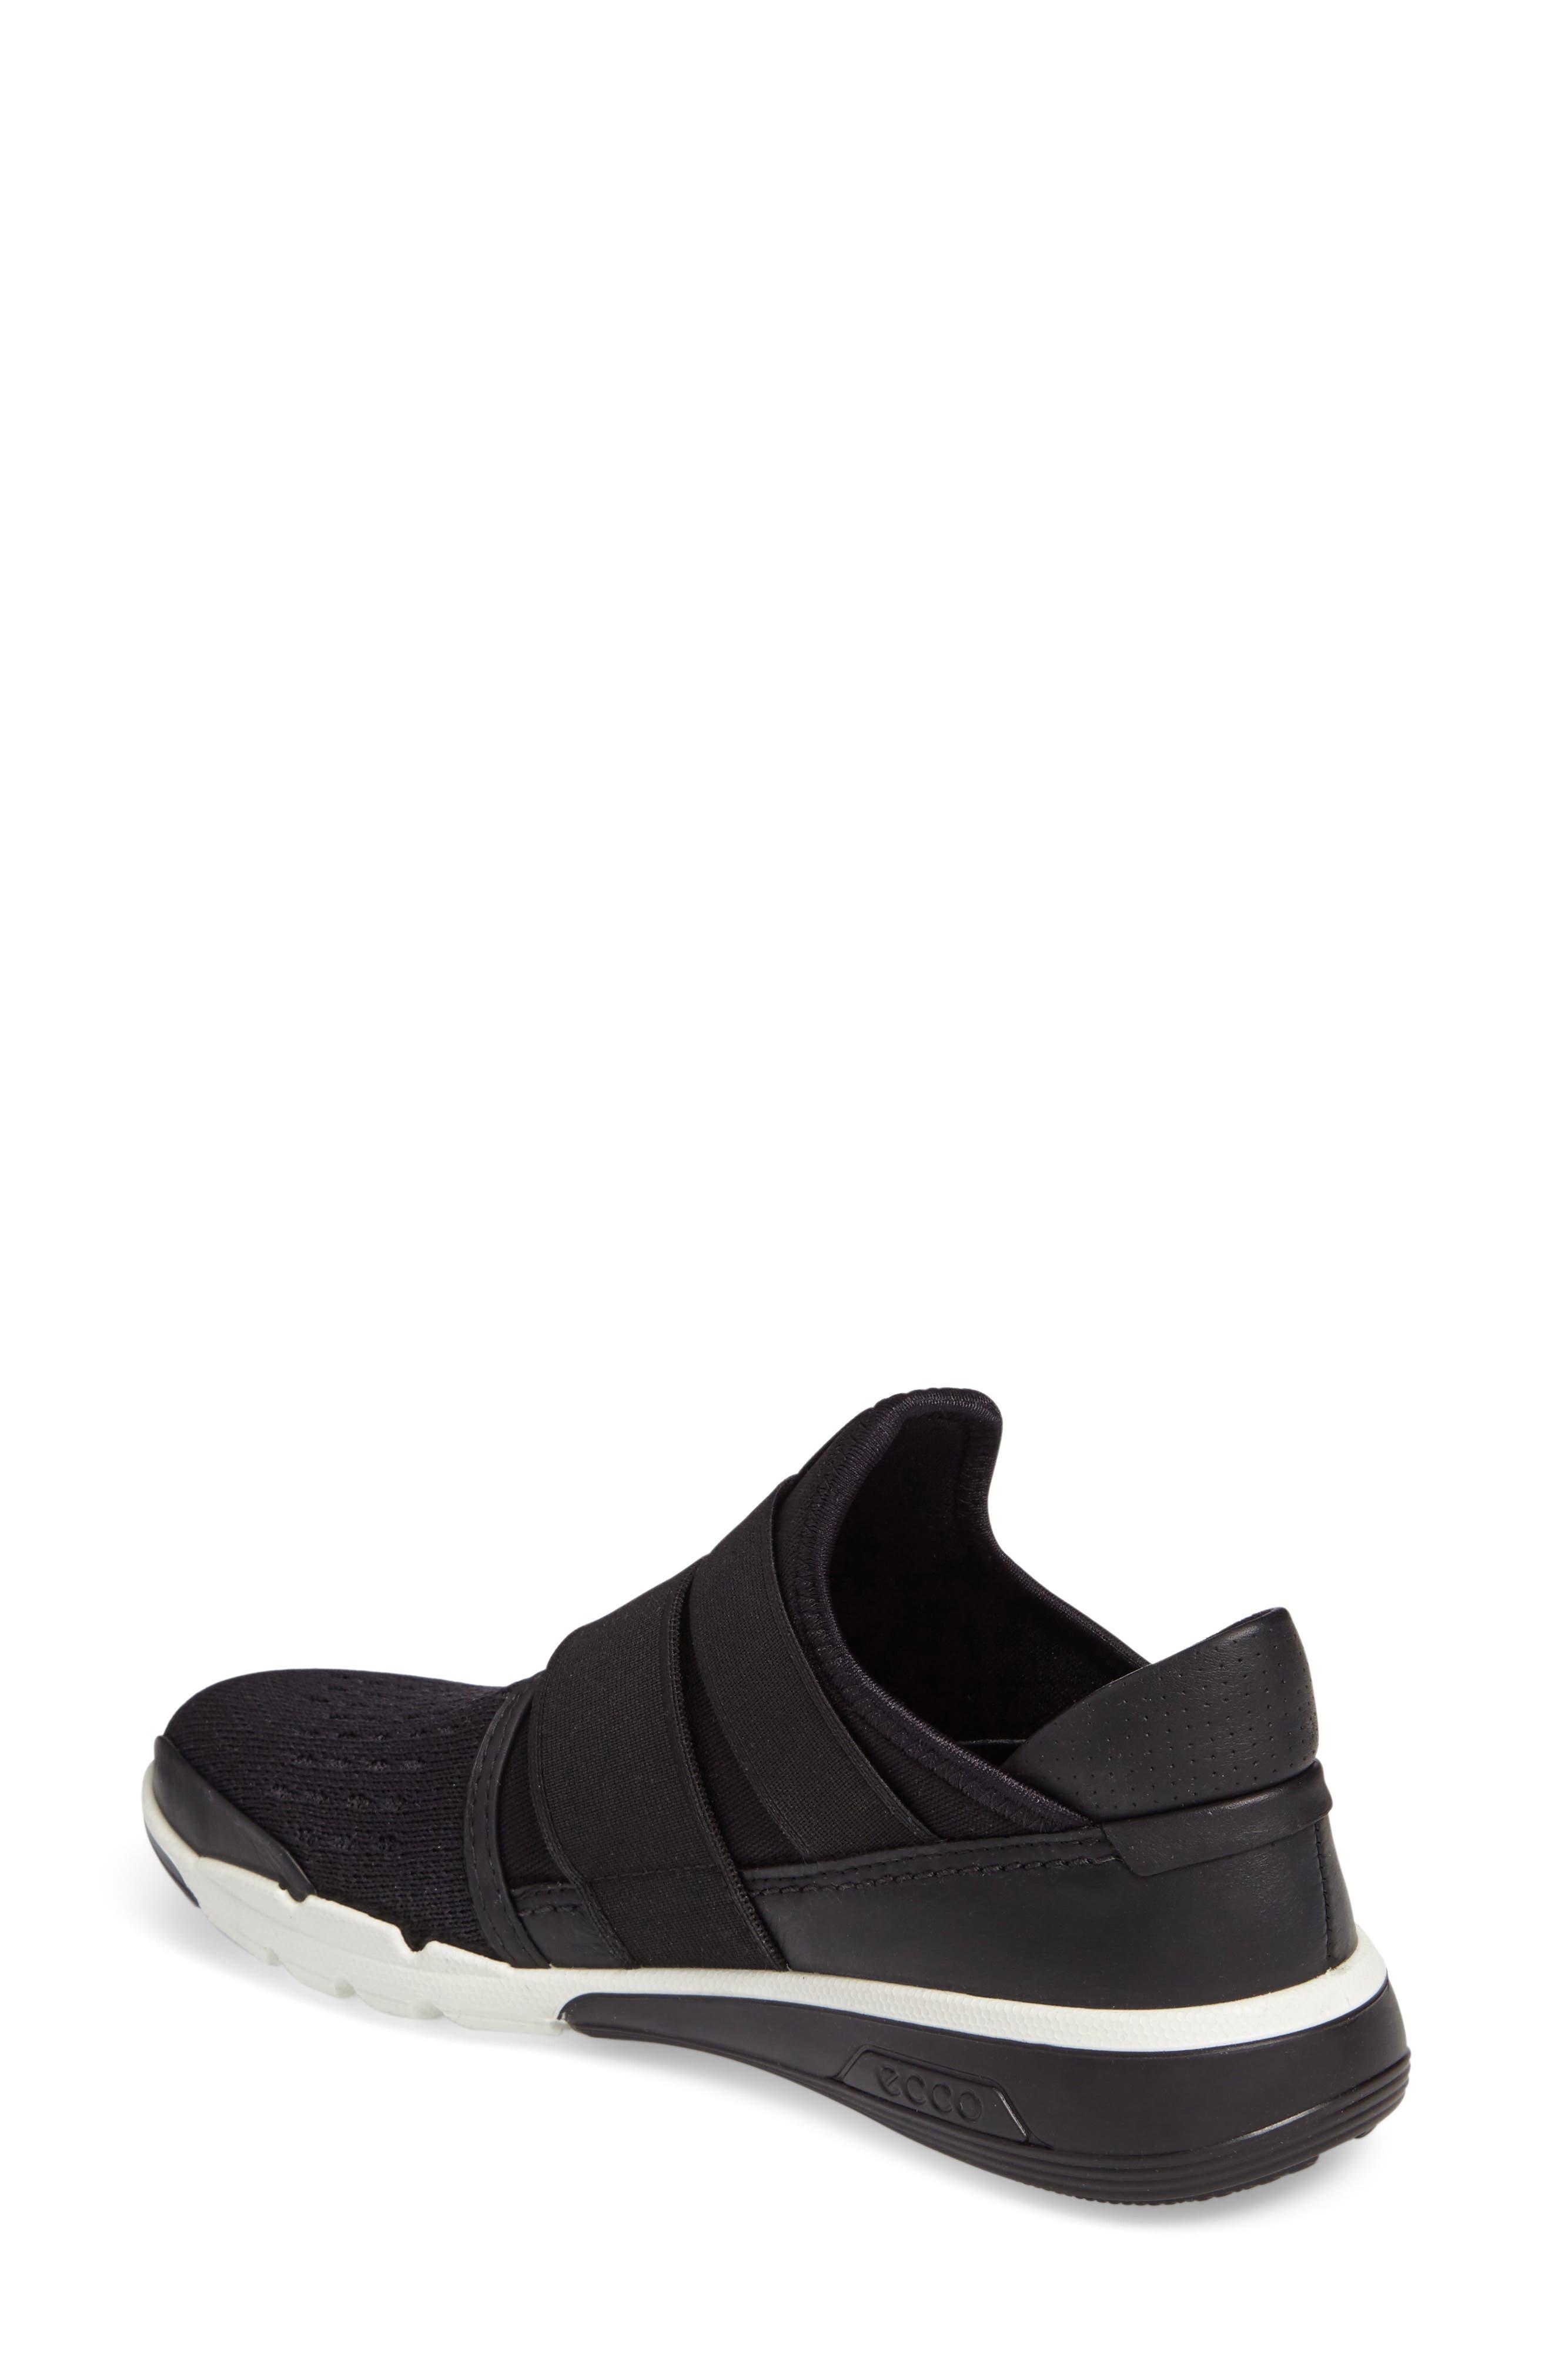 'Intrinsic 2' Sneaker,                             Alternate thumbnail 2, color,                             001